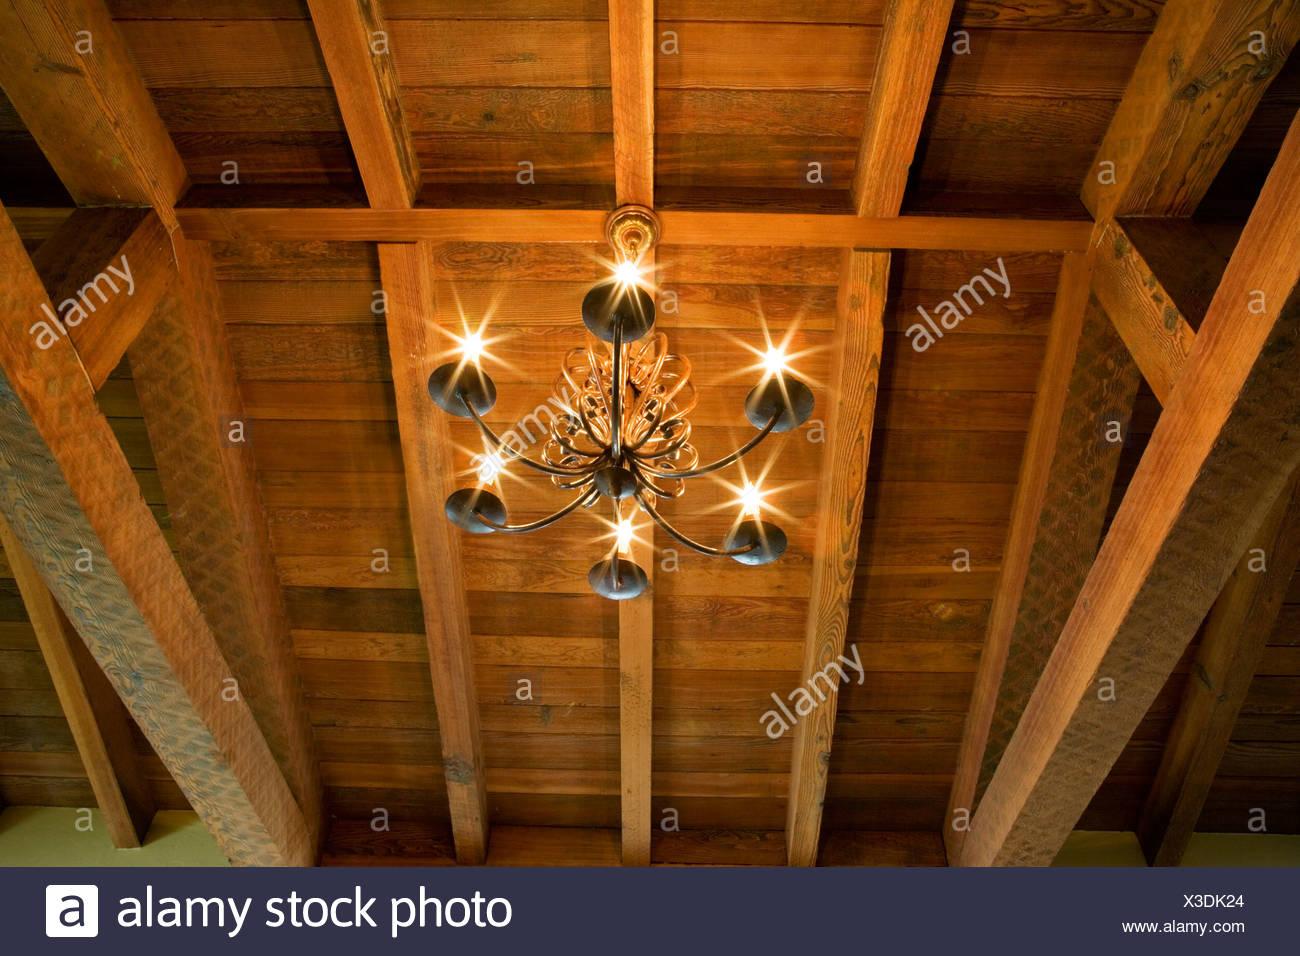 Kronleuchter Holz ~ Detail der kronleuchter und holz holzbalken decke stockfoto bild